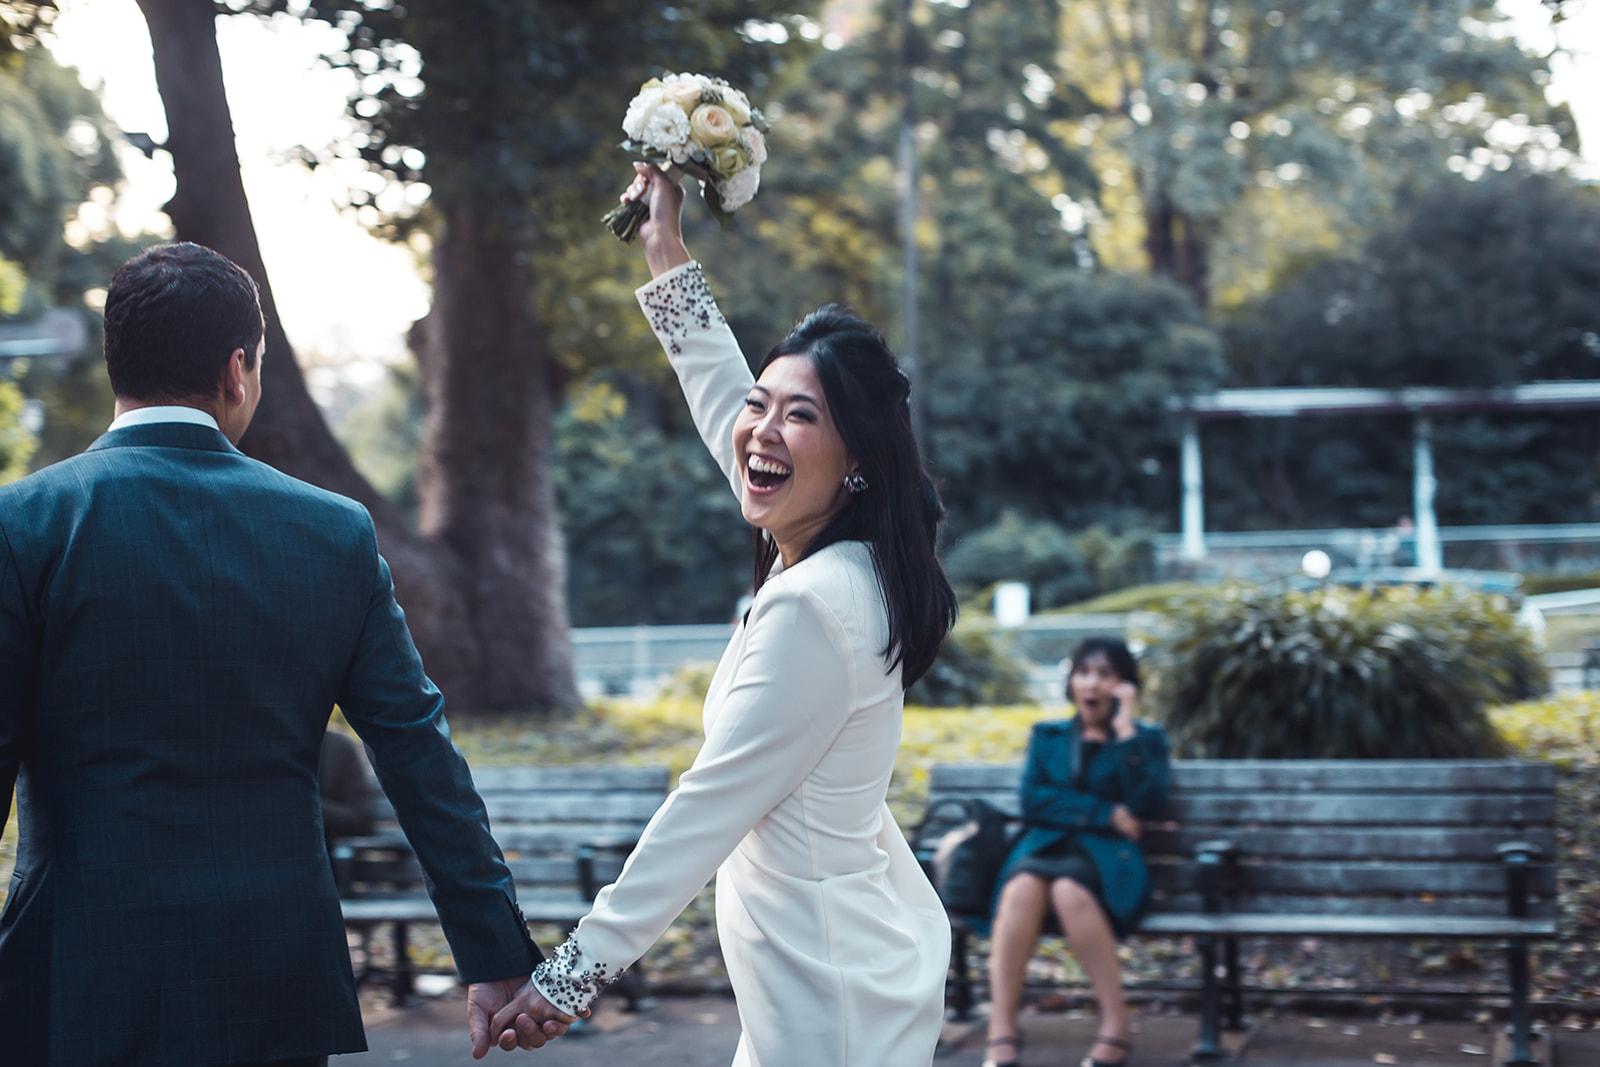 Prewedding pre wedding engagement in Tokyo Japan hire photographer.jpg